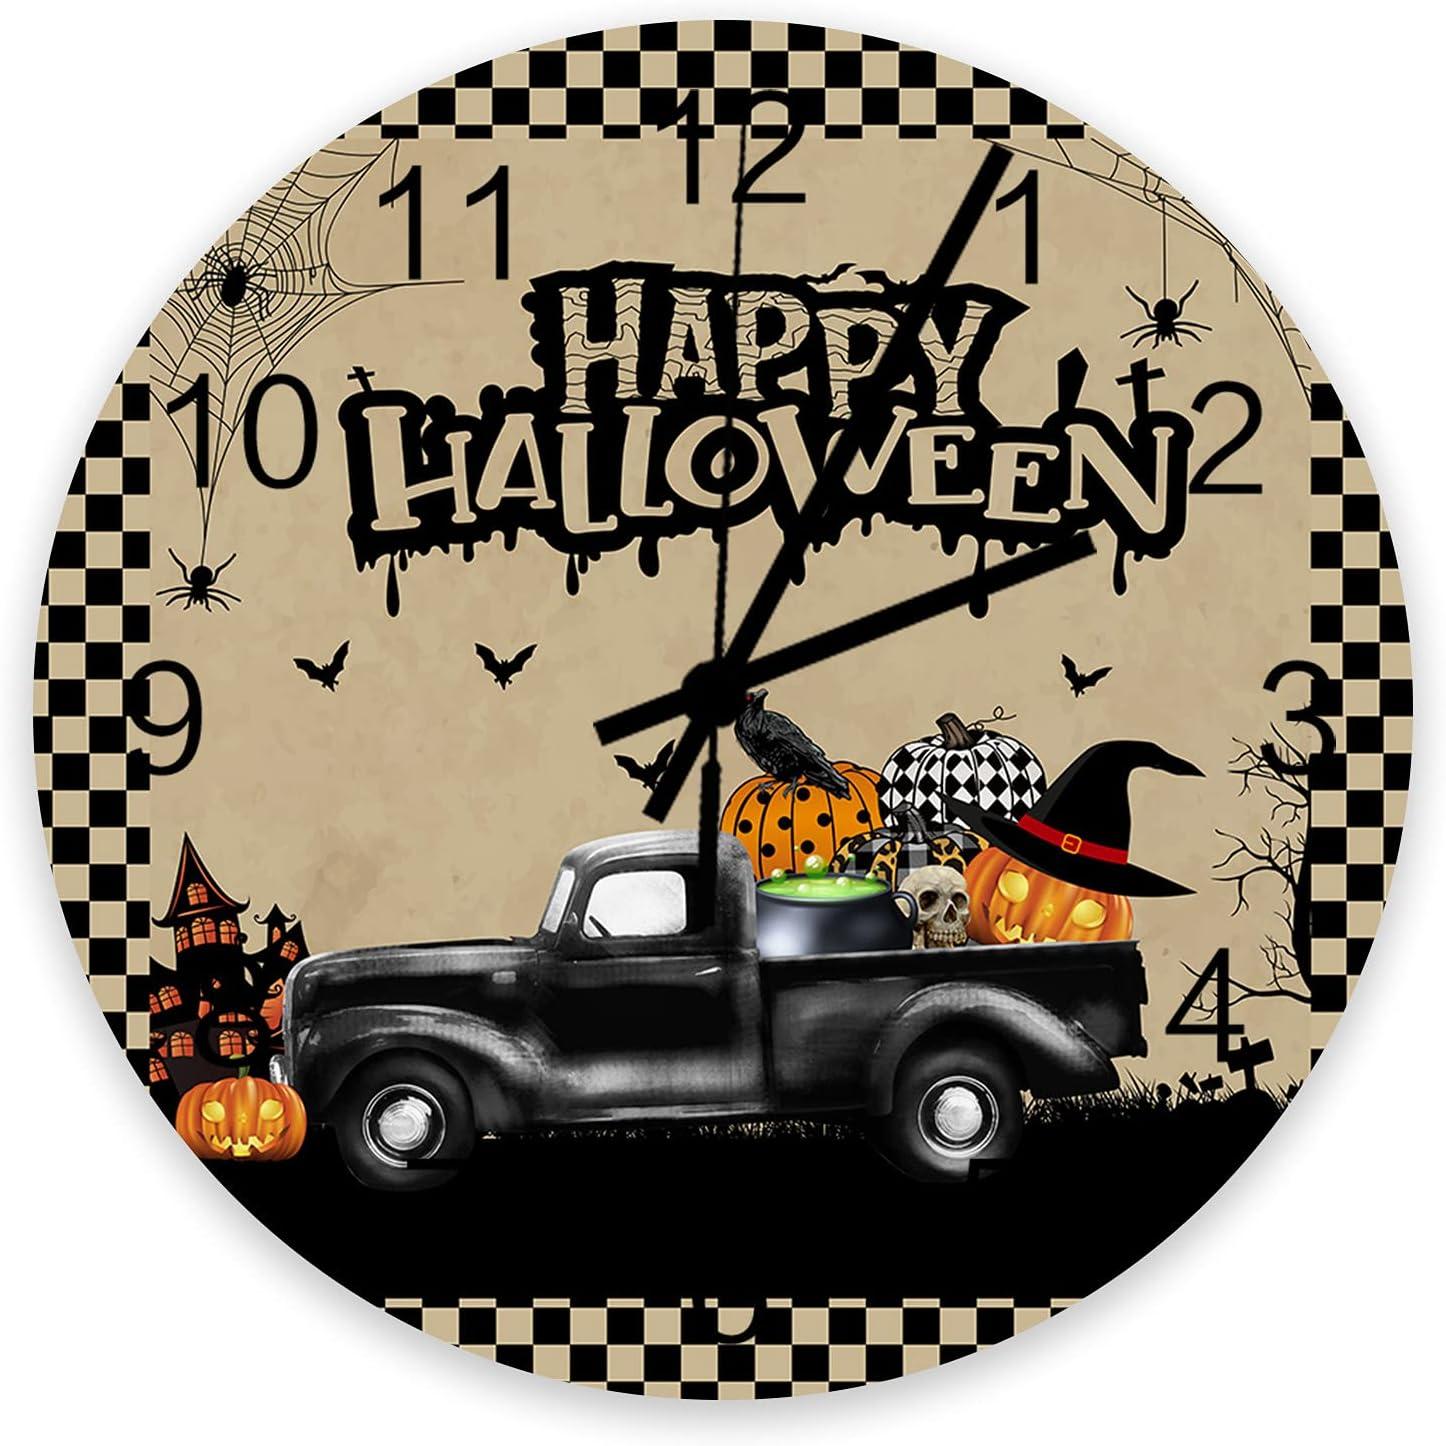 Home Decor 12 Large discharge sale Inch Round Wooden Pum Truck Clock Halloween Branded goods Black